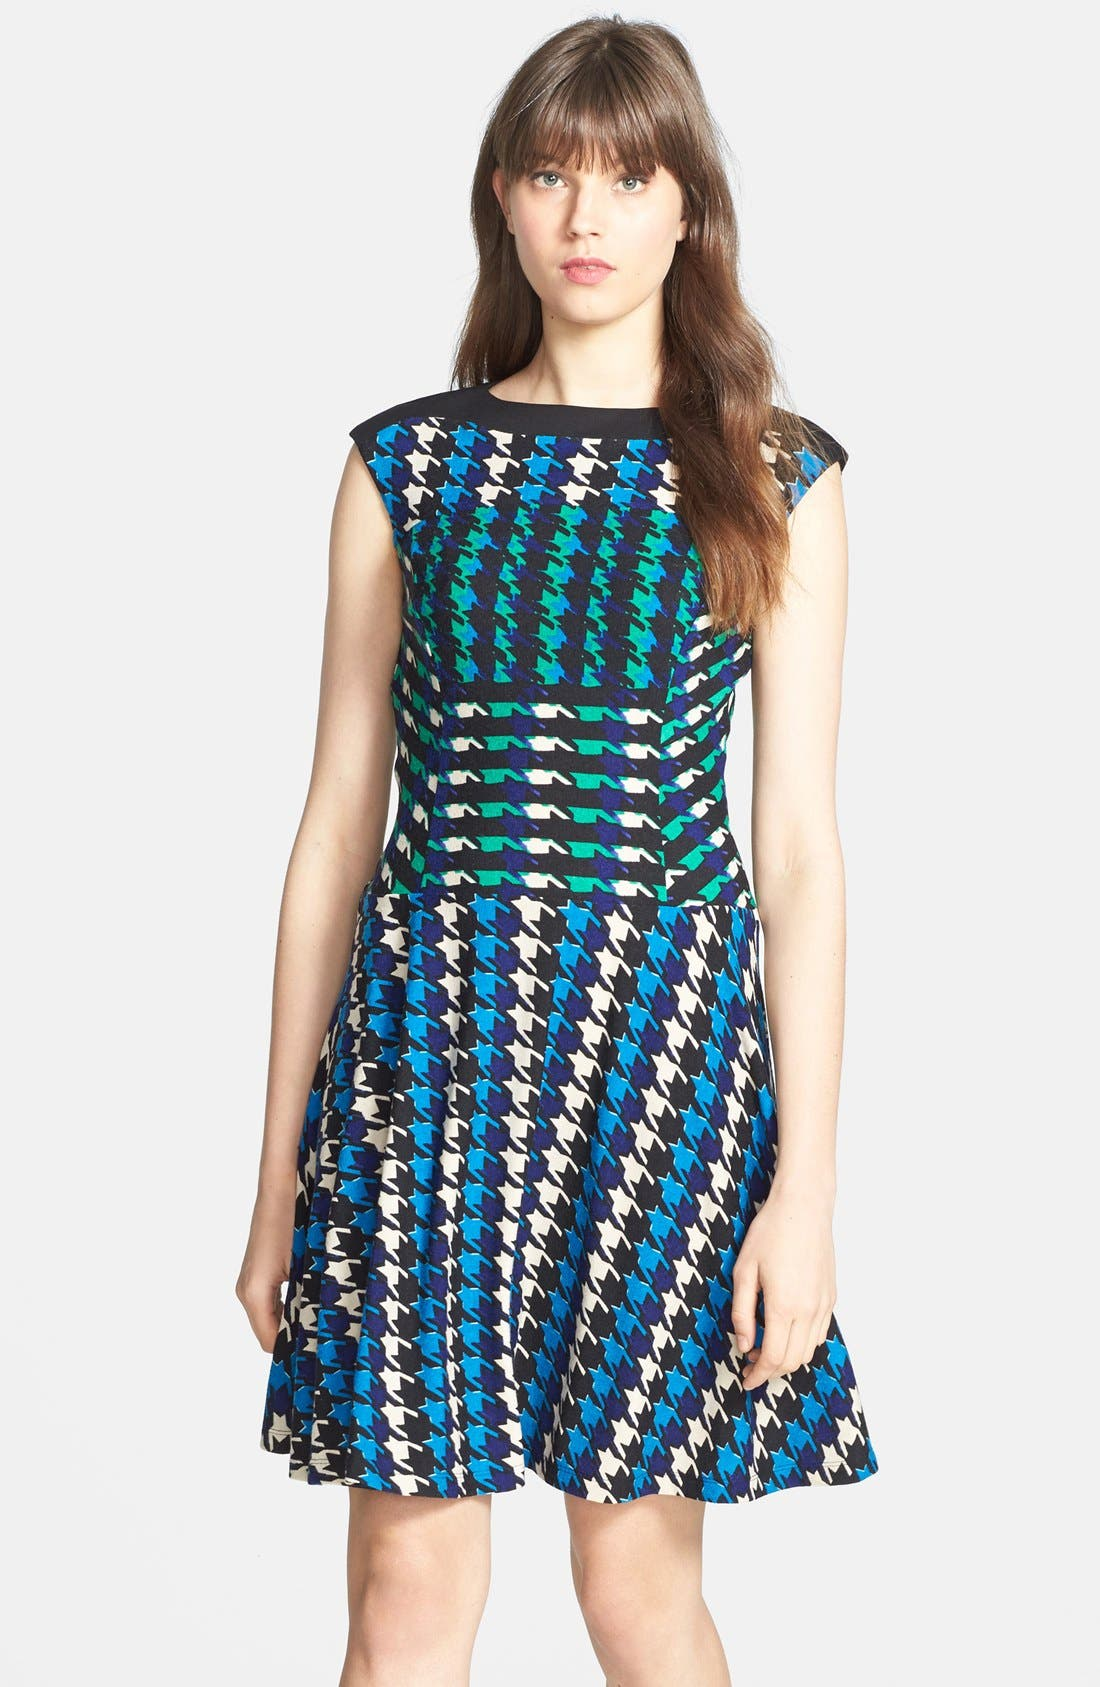 Alternate Image 1 Selected - Gabby Skye Houndstooth Print Ponte Knit Fit & Flare Dress